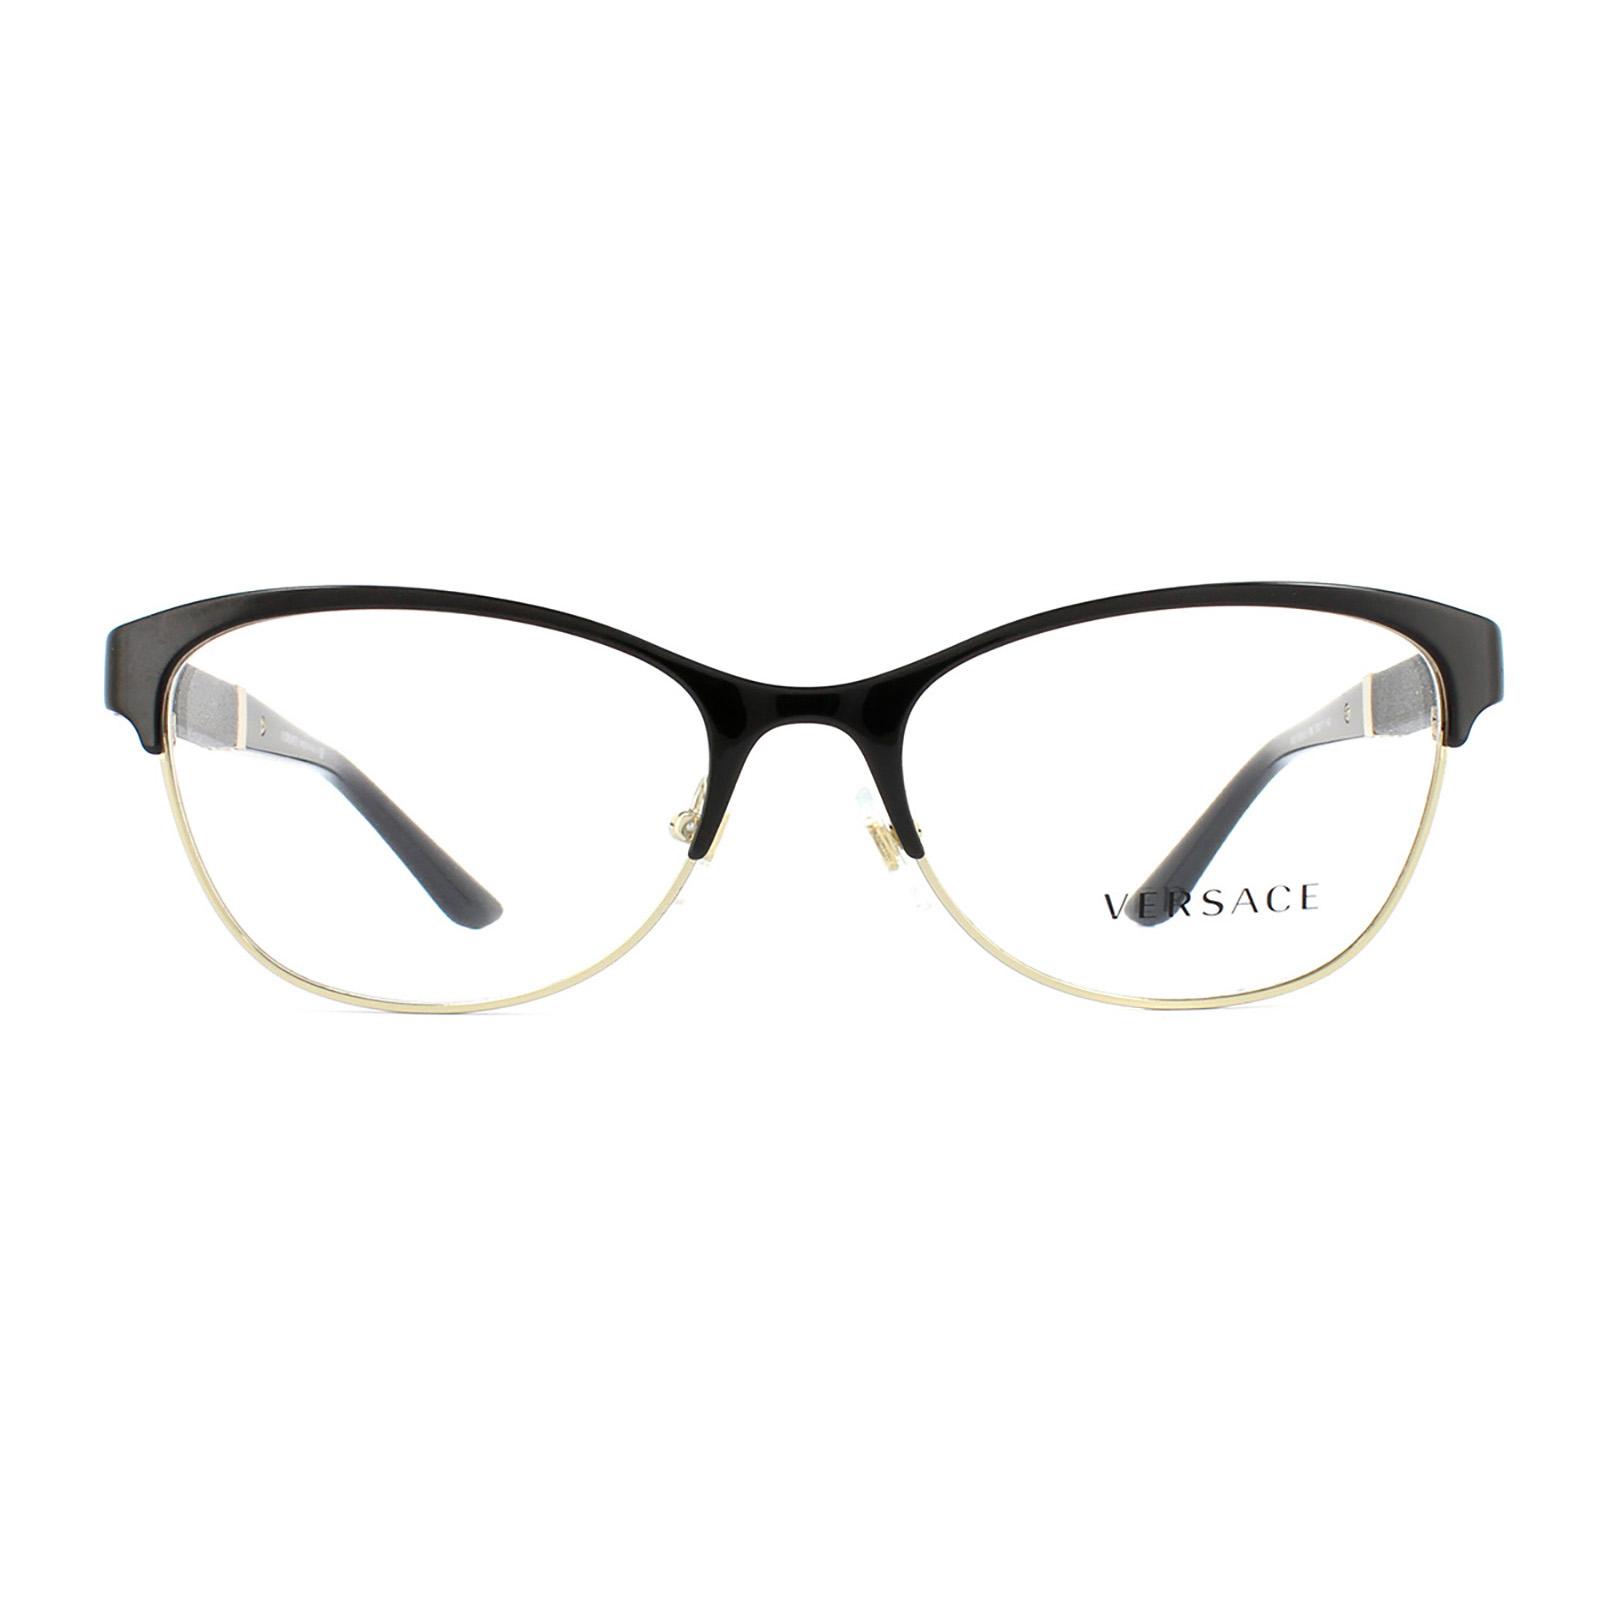 4a429742cb3e Versace Sunglasses Cheapest